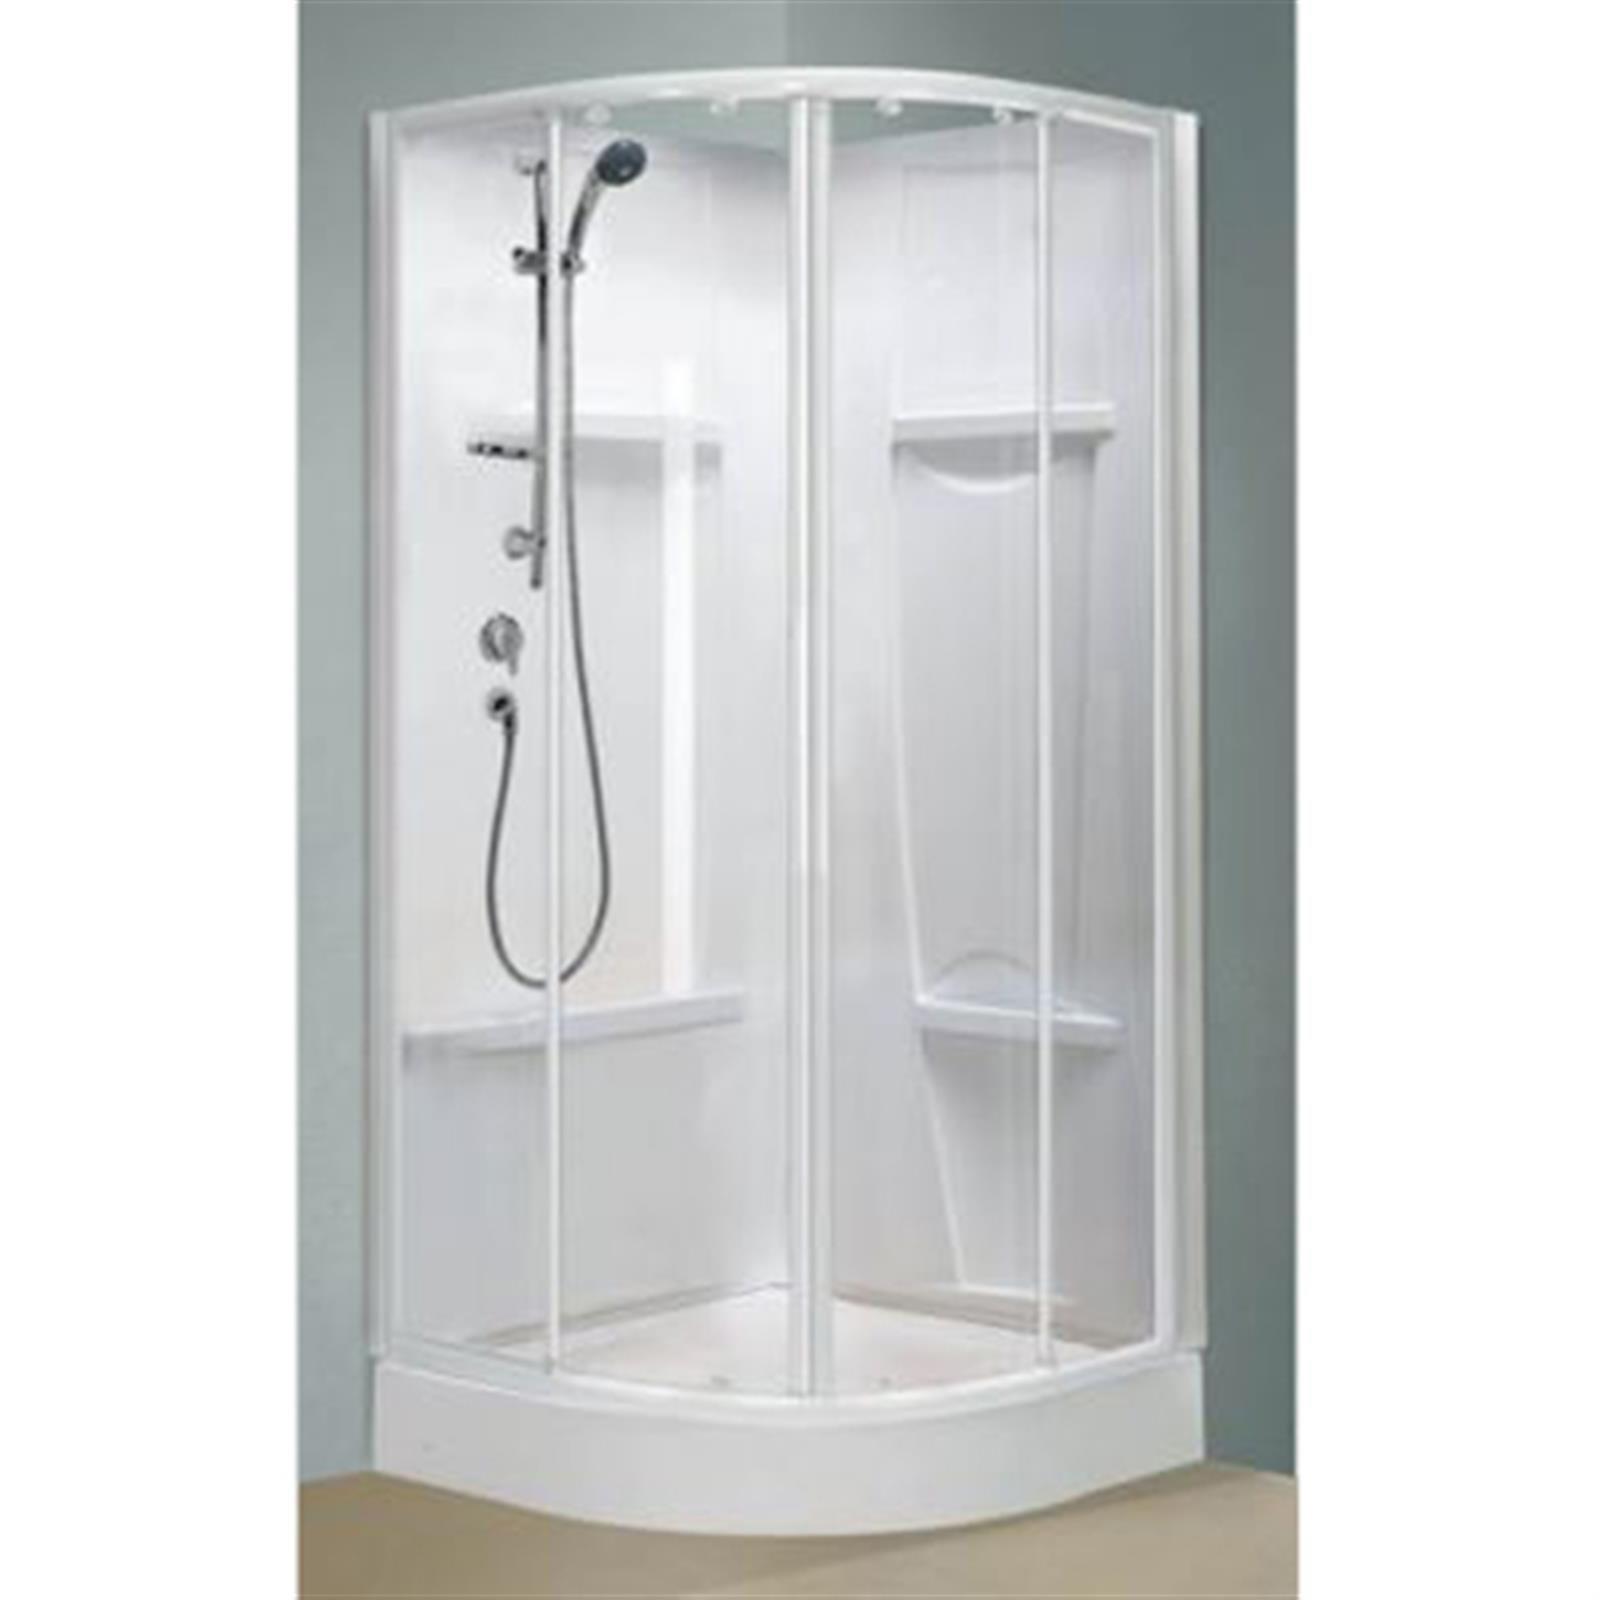 cabine de douche oceane 1 4 de rond alutrade. Black Bedroom Furniture Sets. Home Design Ideas